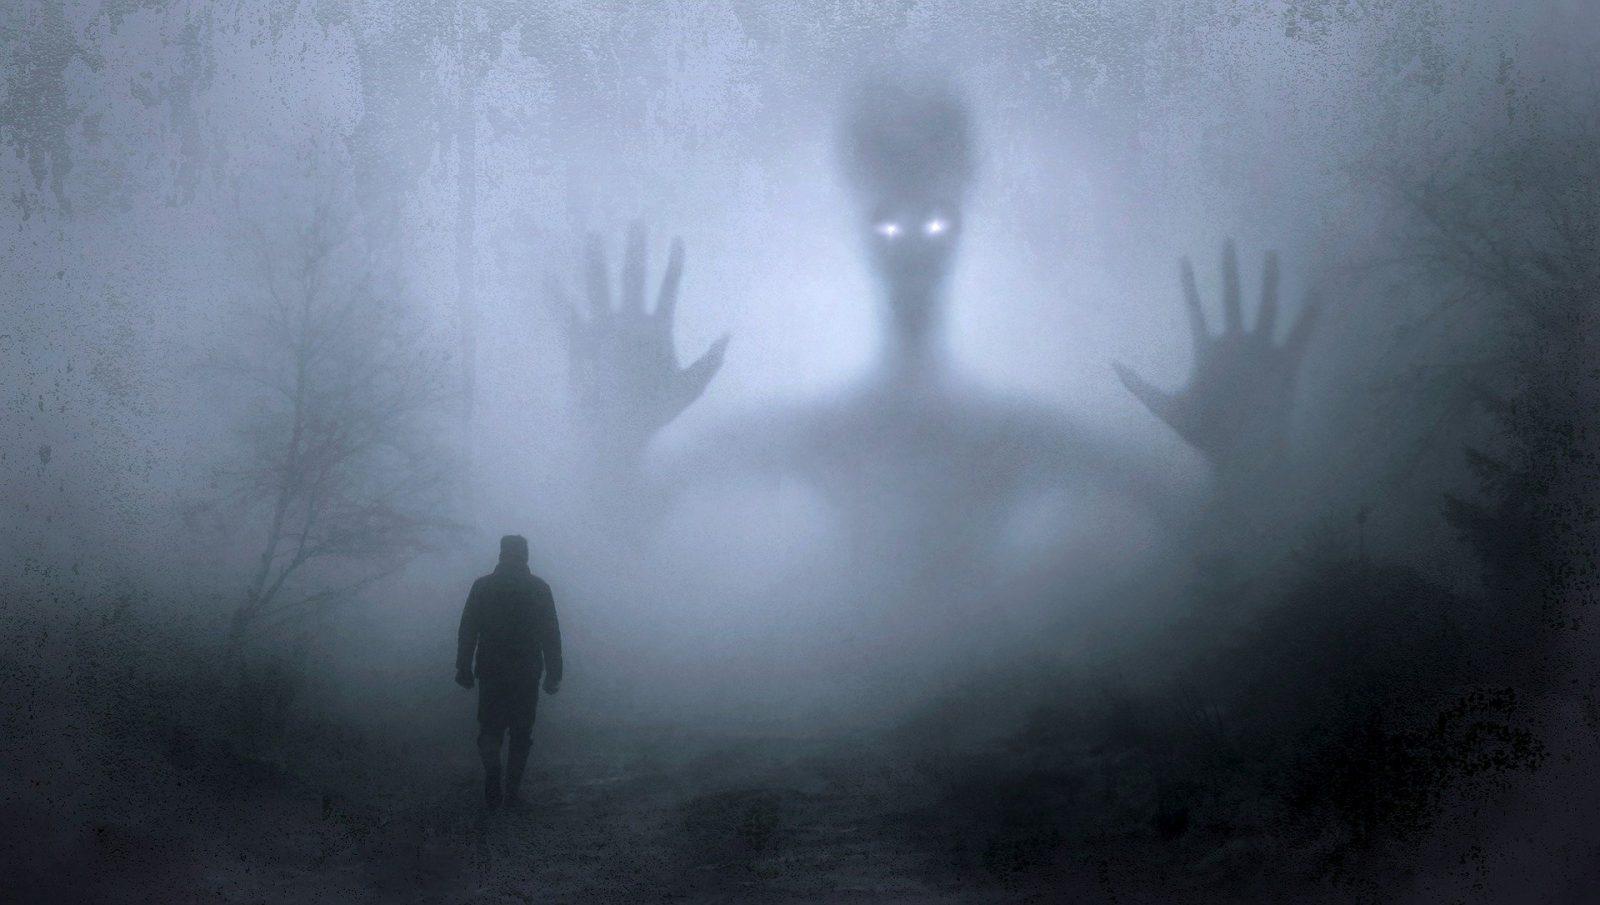 «Пандемия мозга или «Нур Отан» снимает порчу с партии». Казахстанцы о магических ритуалах в Караганде